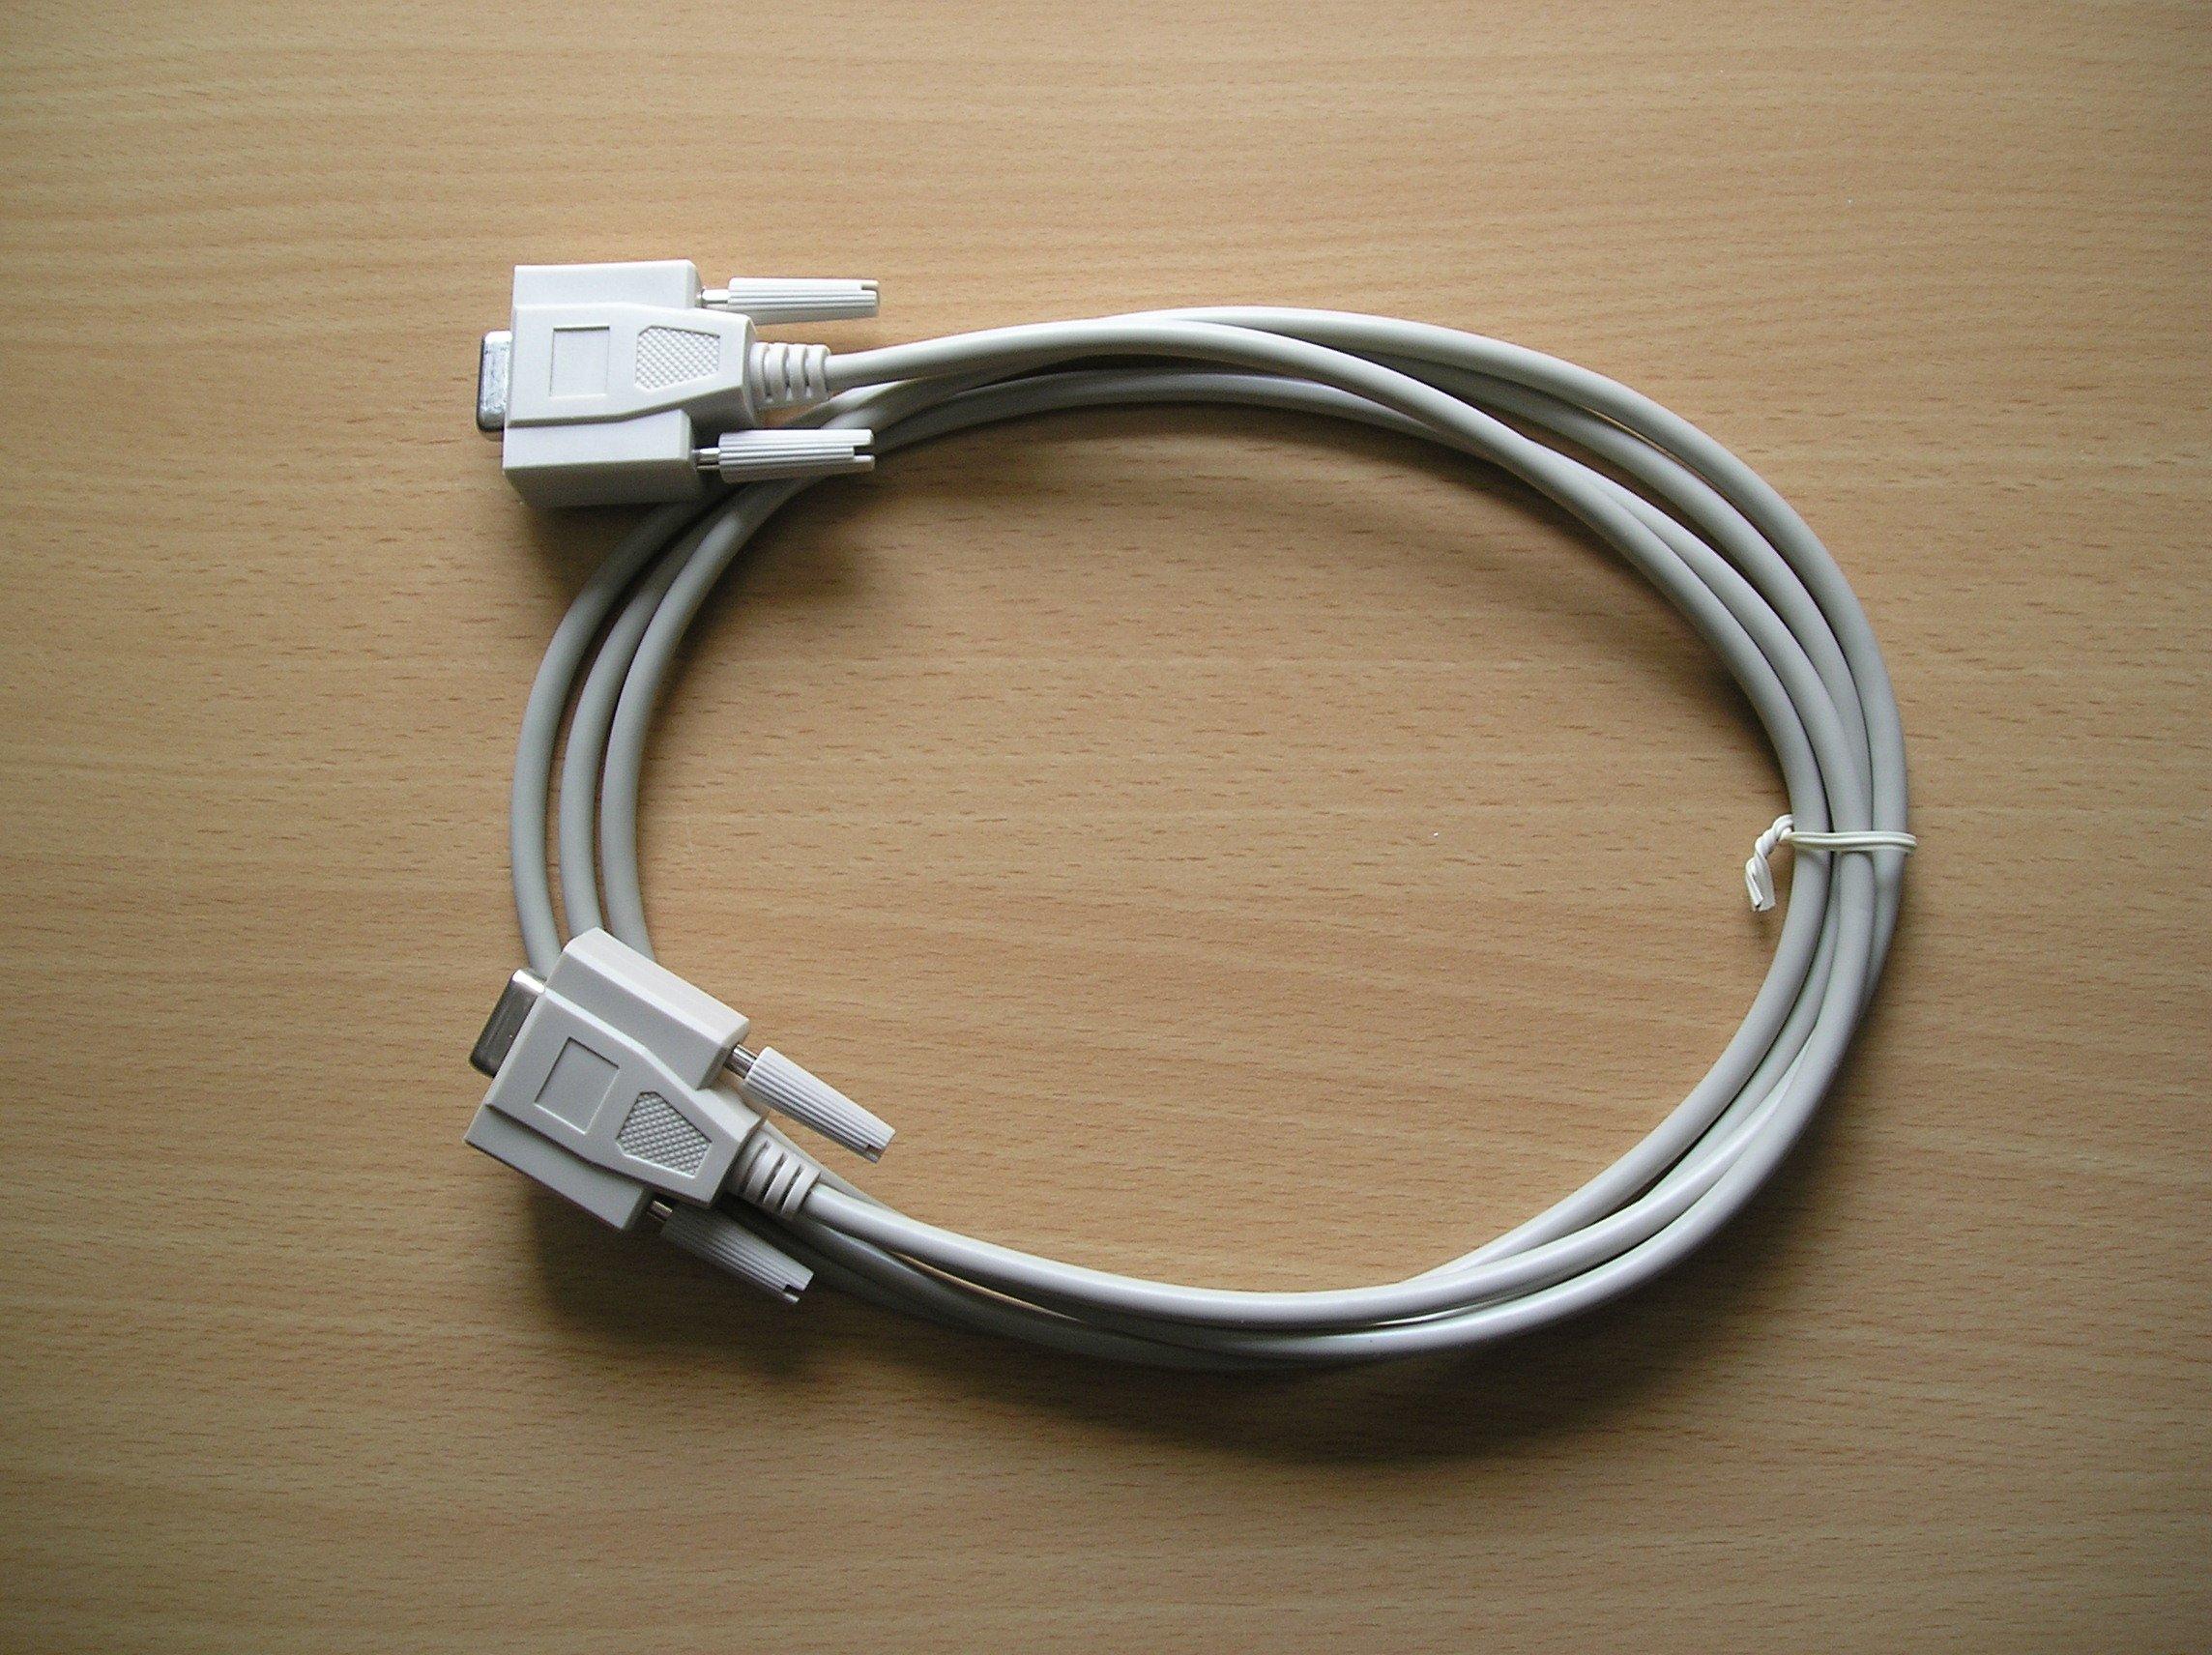 rs232 to rj45 null modem wiring diagram strat